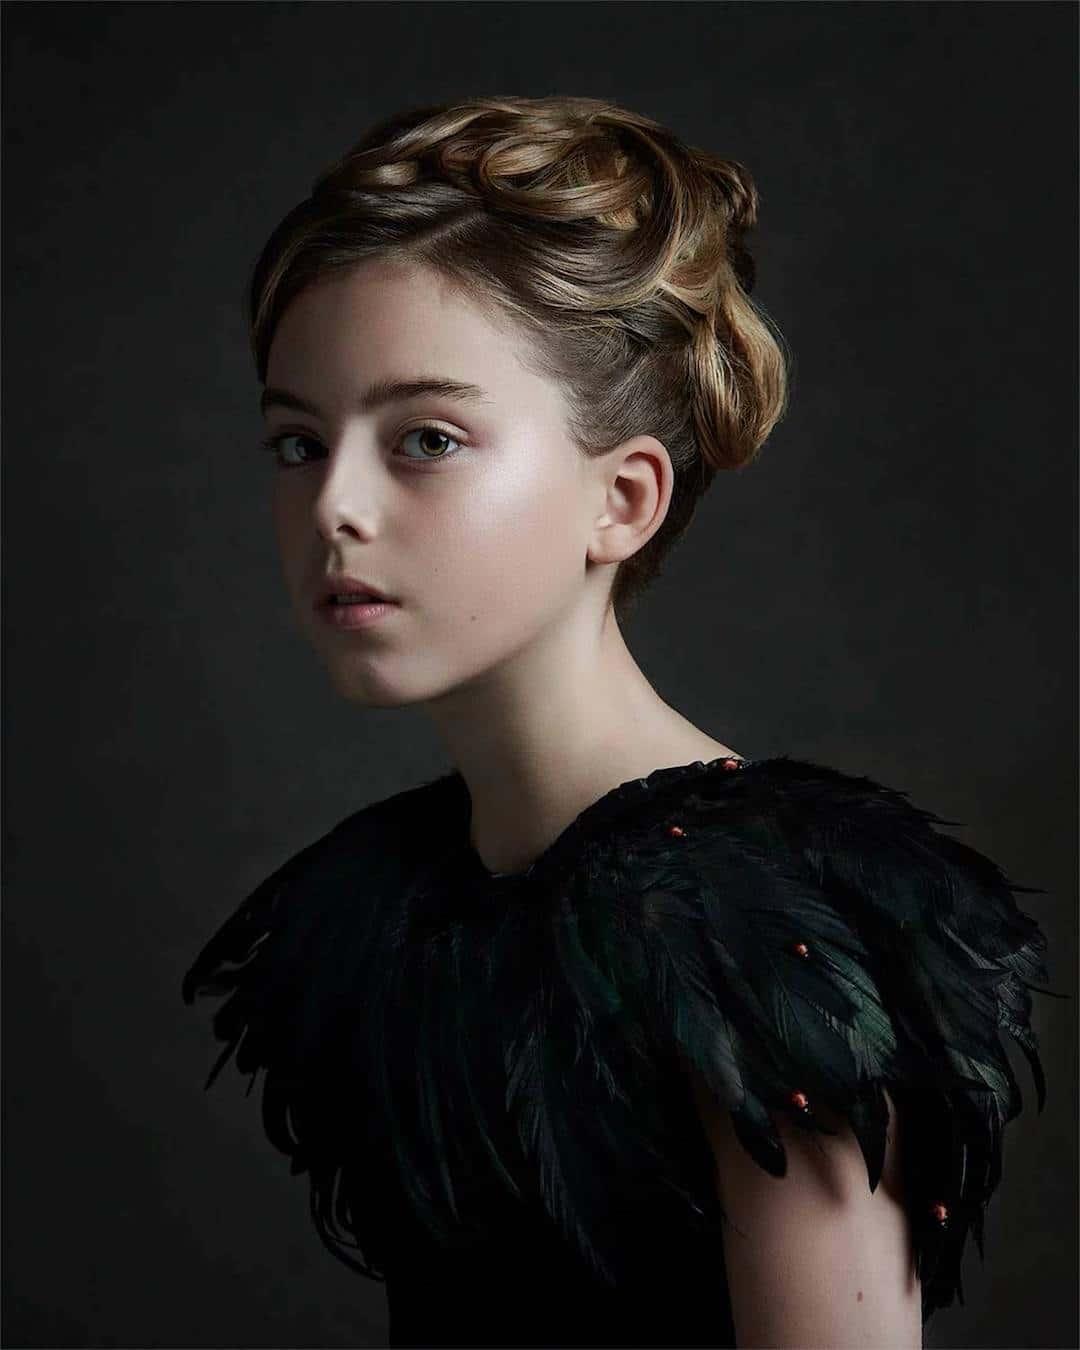 Portrait Lighting Lessons